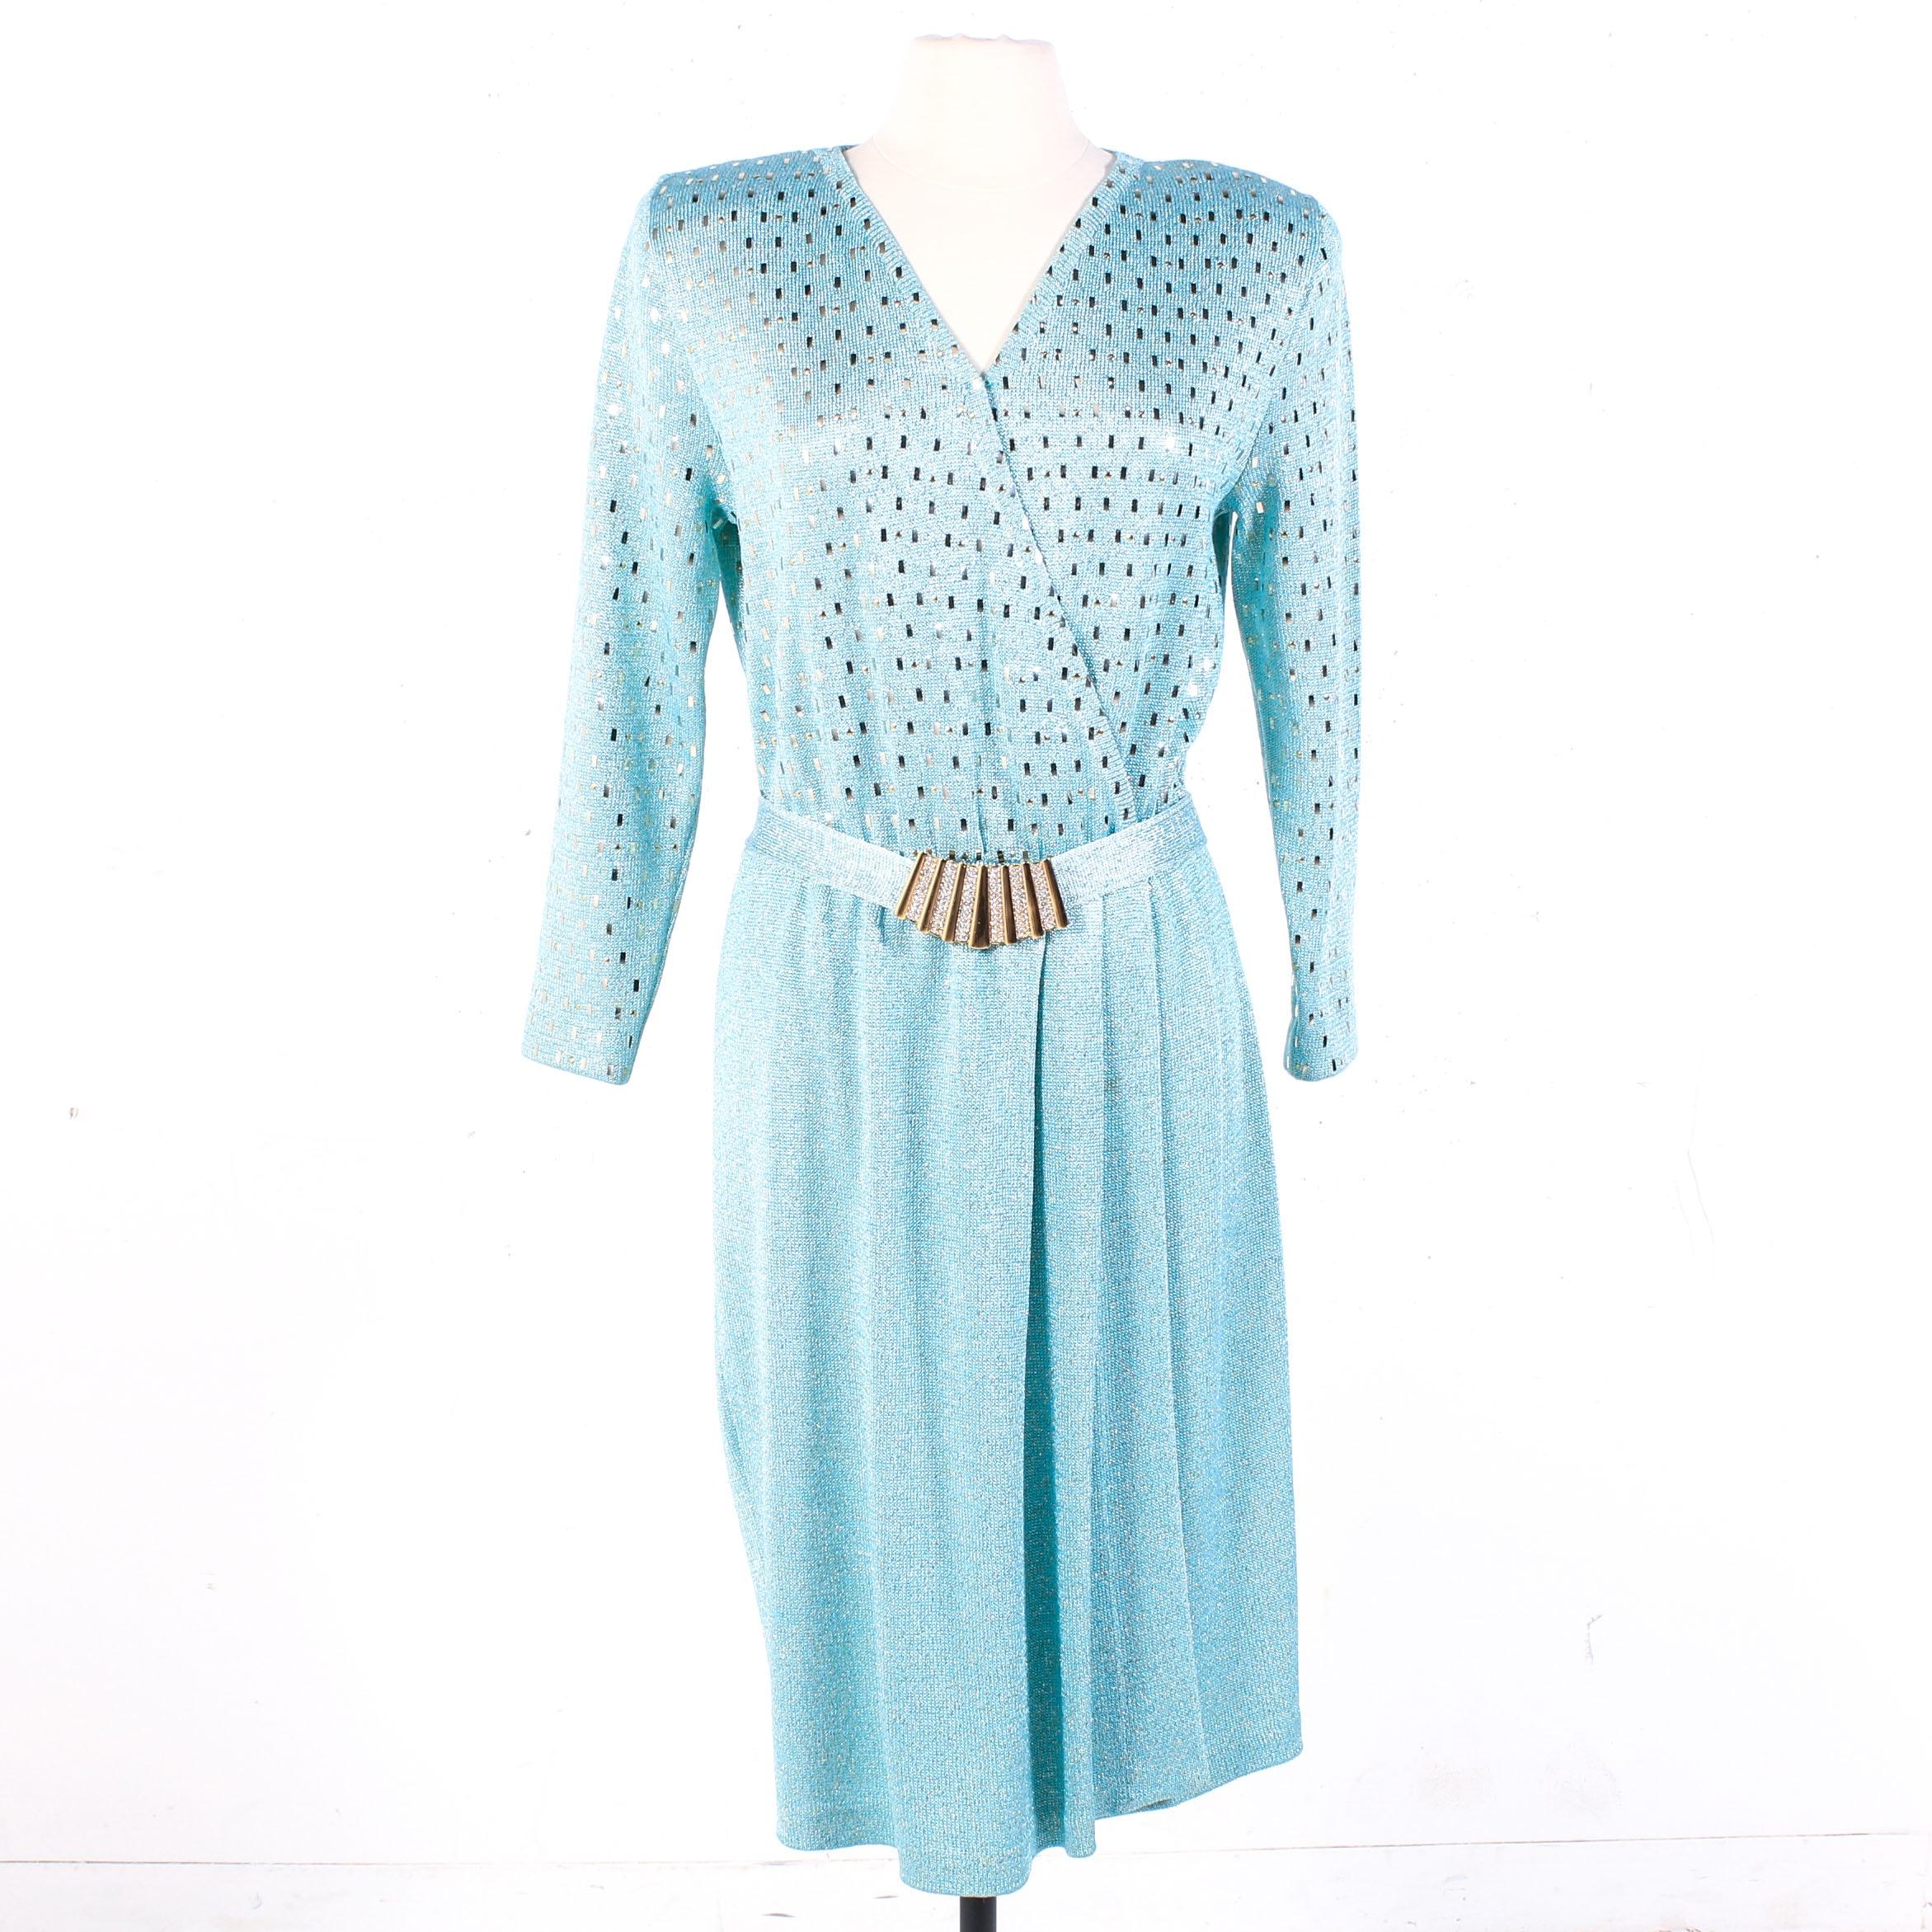 St. John Metallic and Light Blue Knit Faux Wrap Dress, Vintage